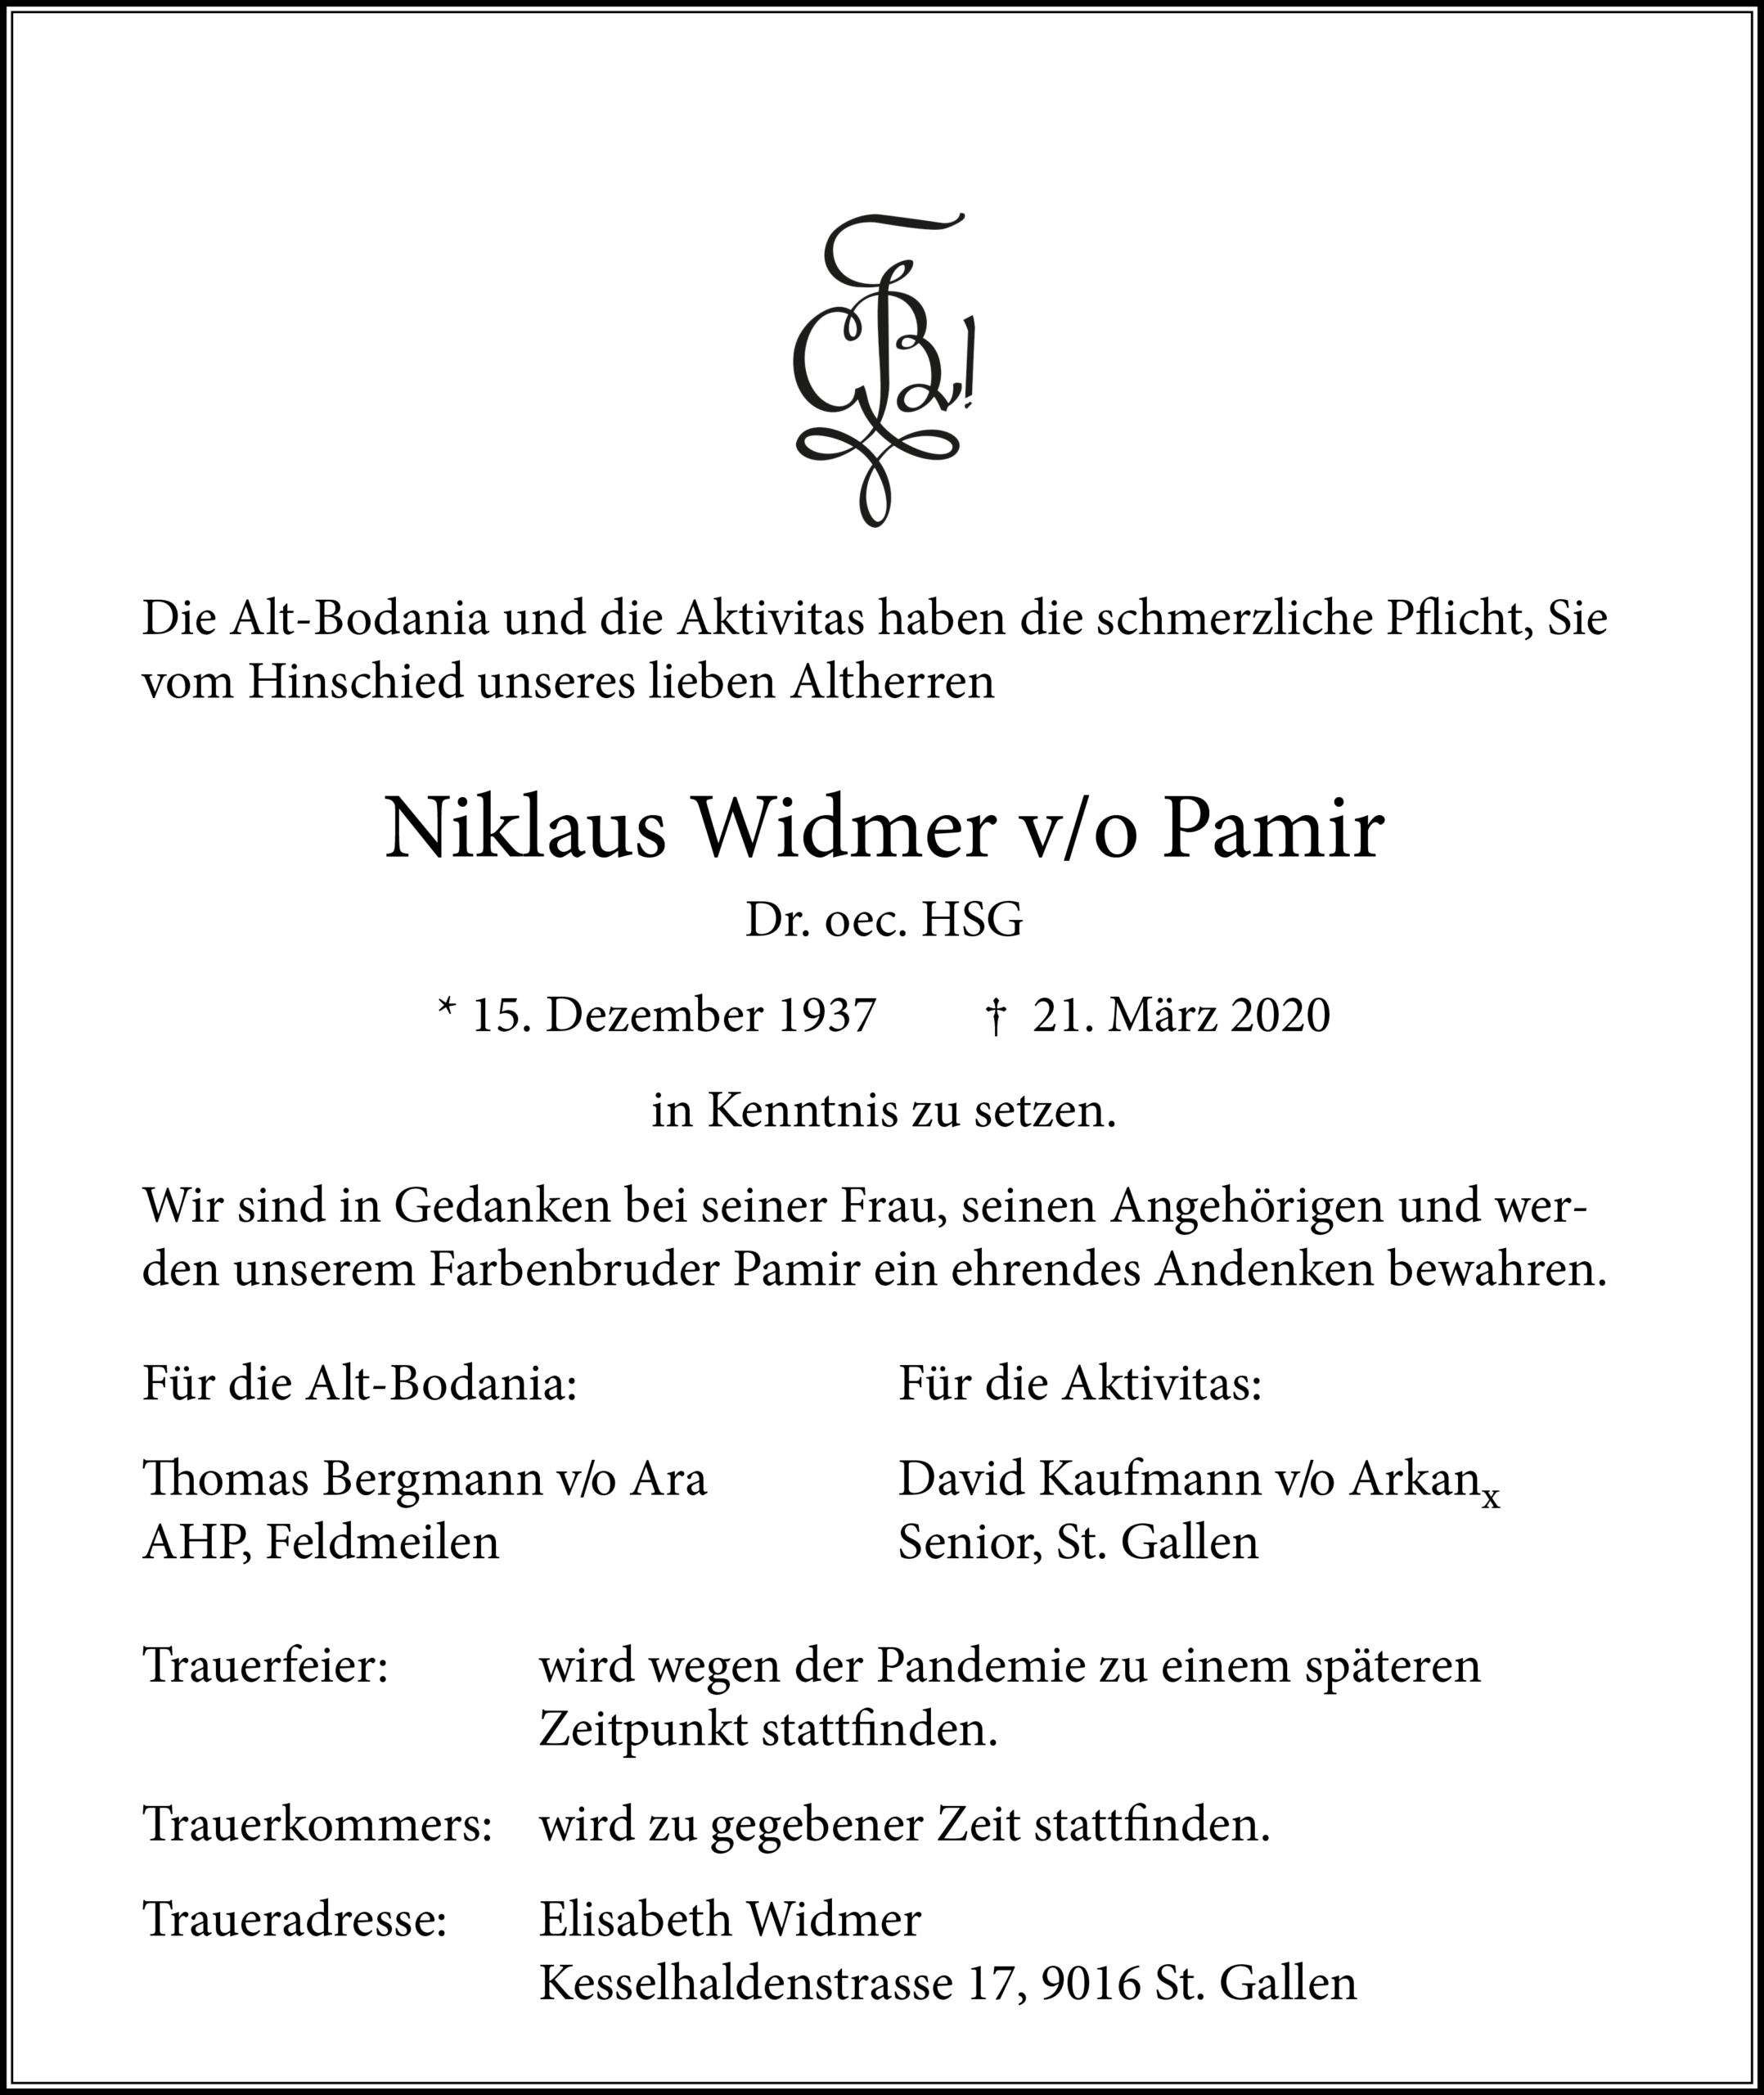 Niklaus Widmer v/o Pamir †